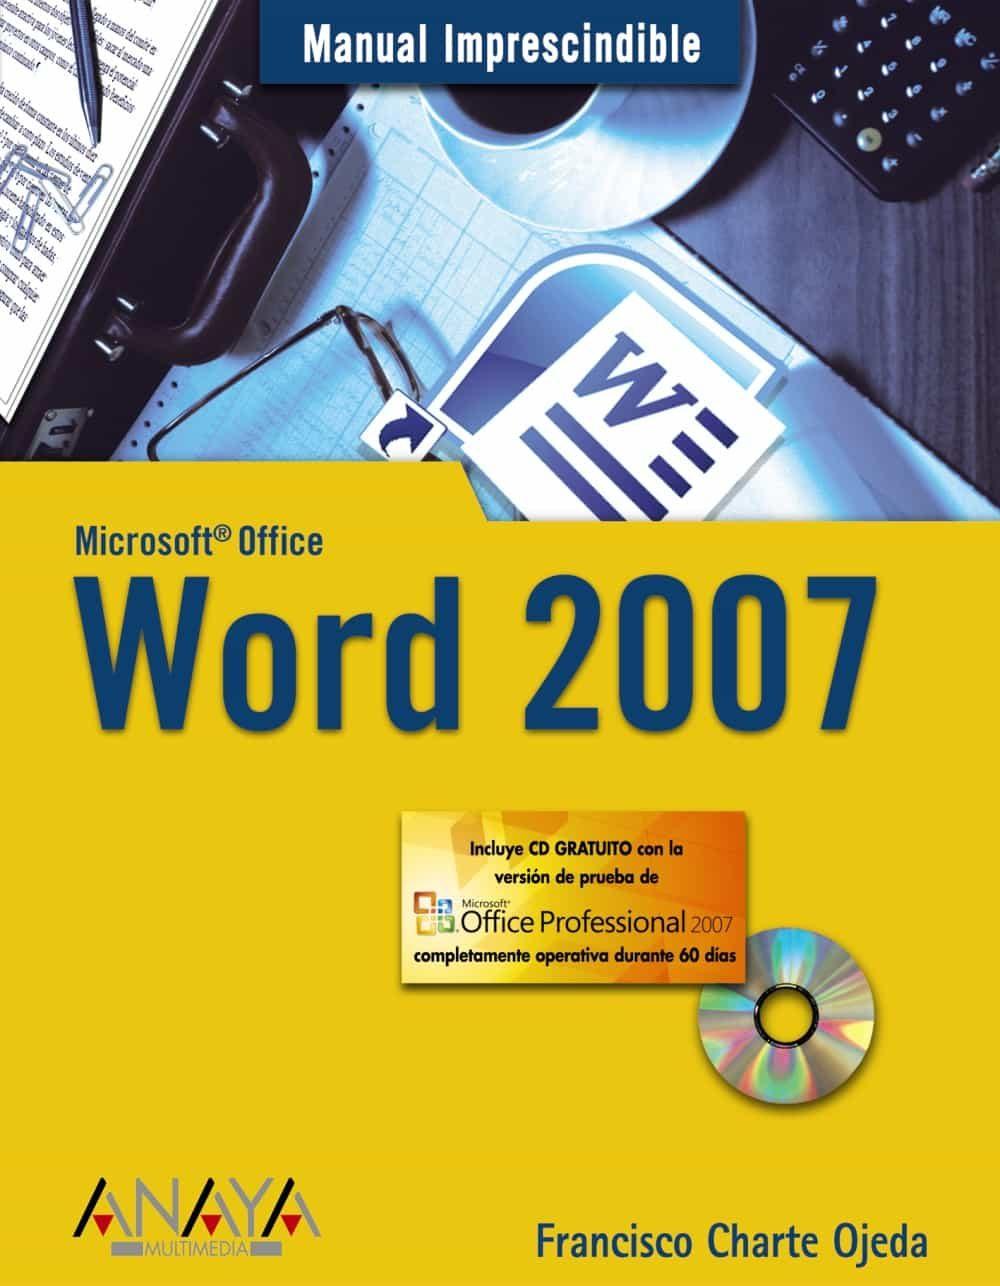 Word 2007 (manual Imprescindible) (incluye Cd-rom) - Charte Ojeda Francisco